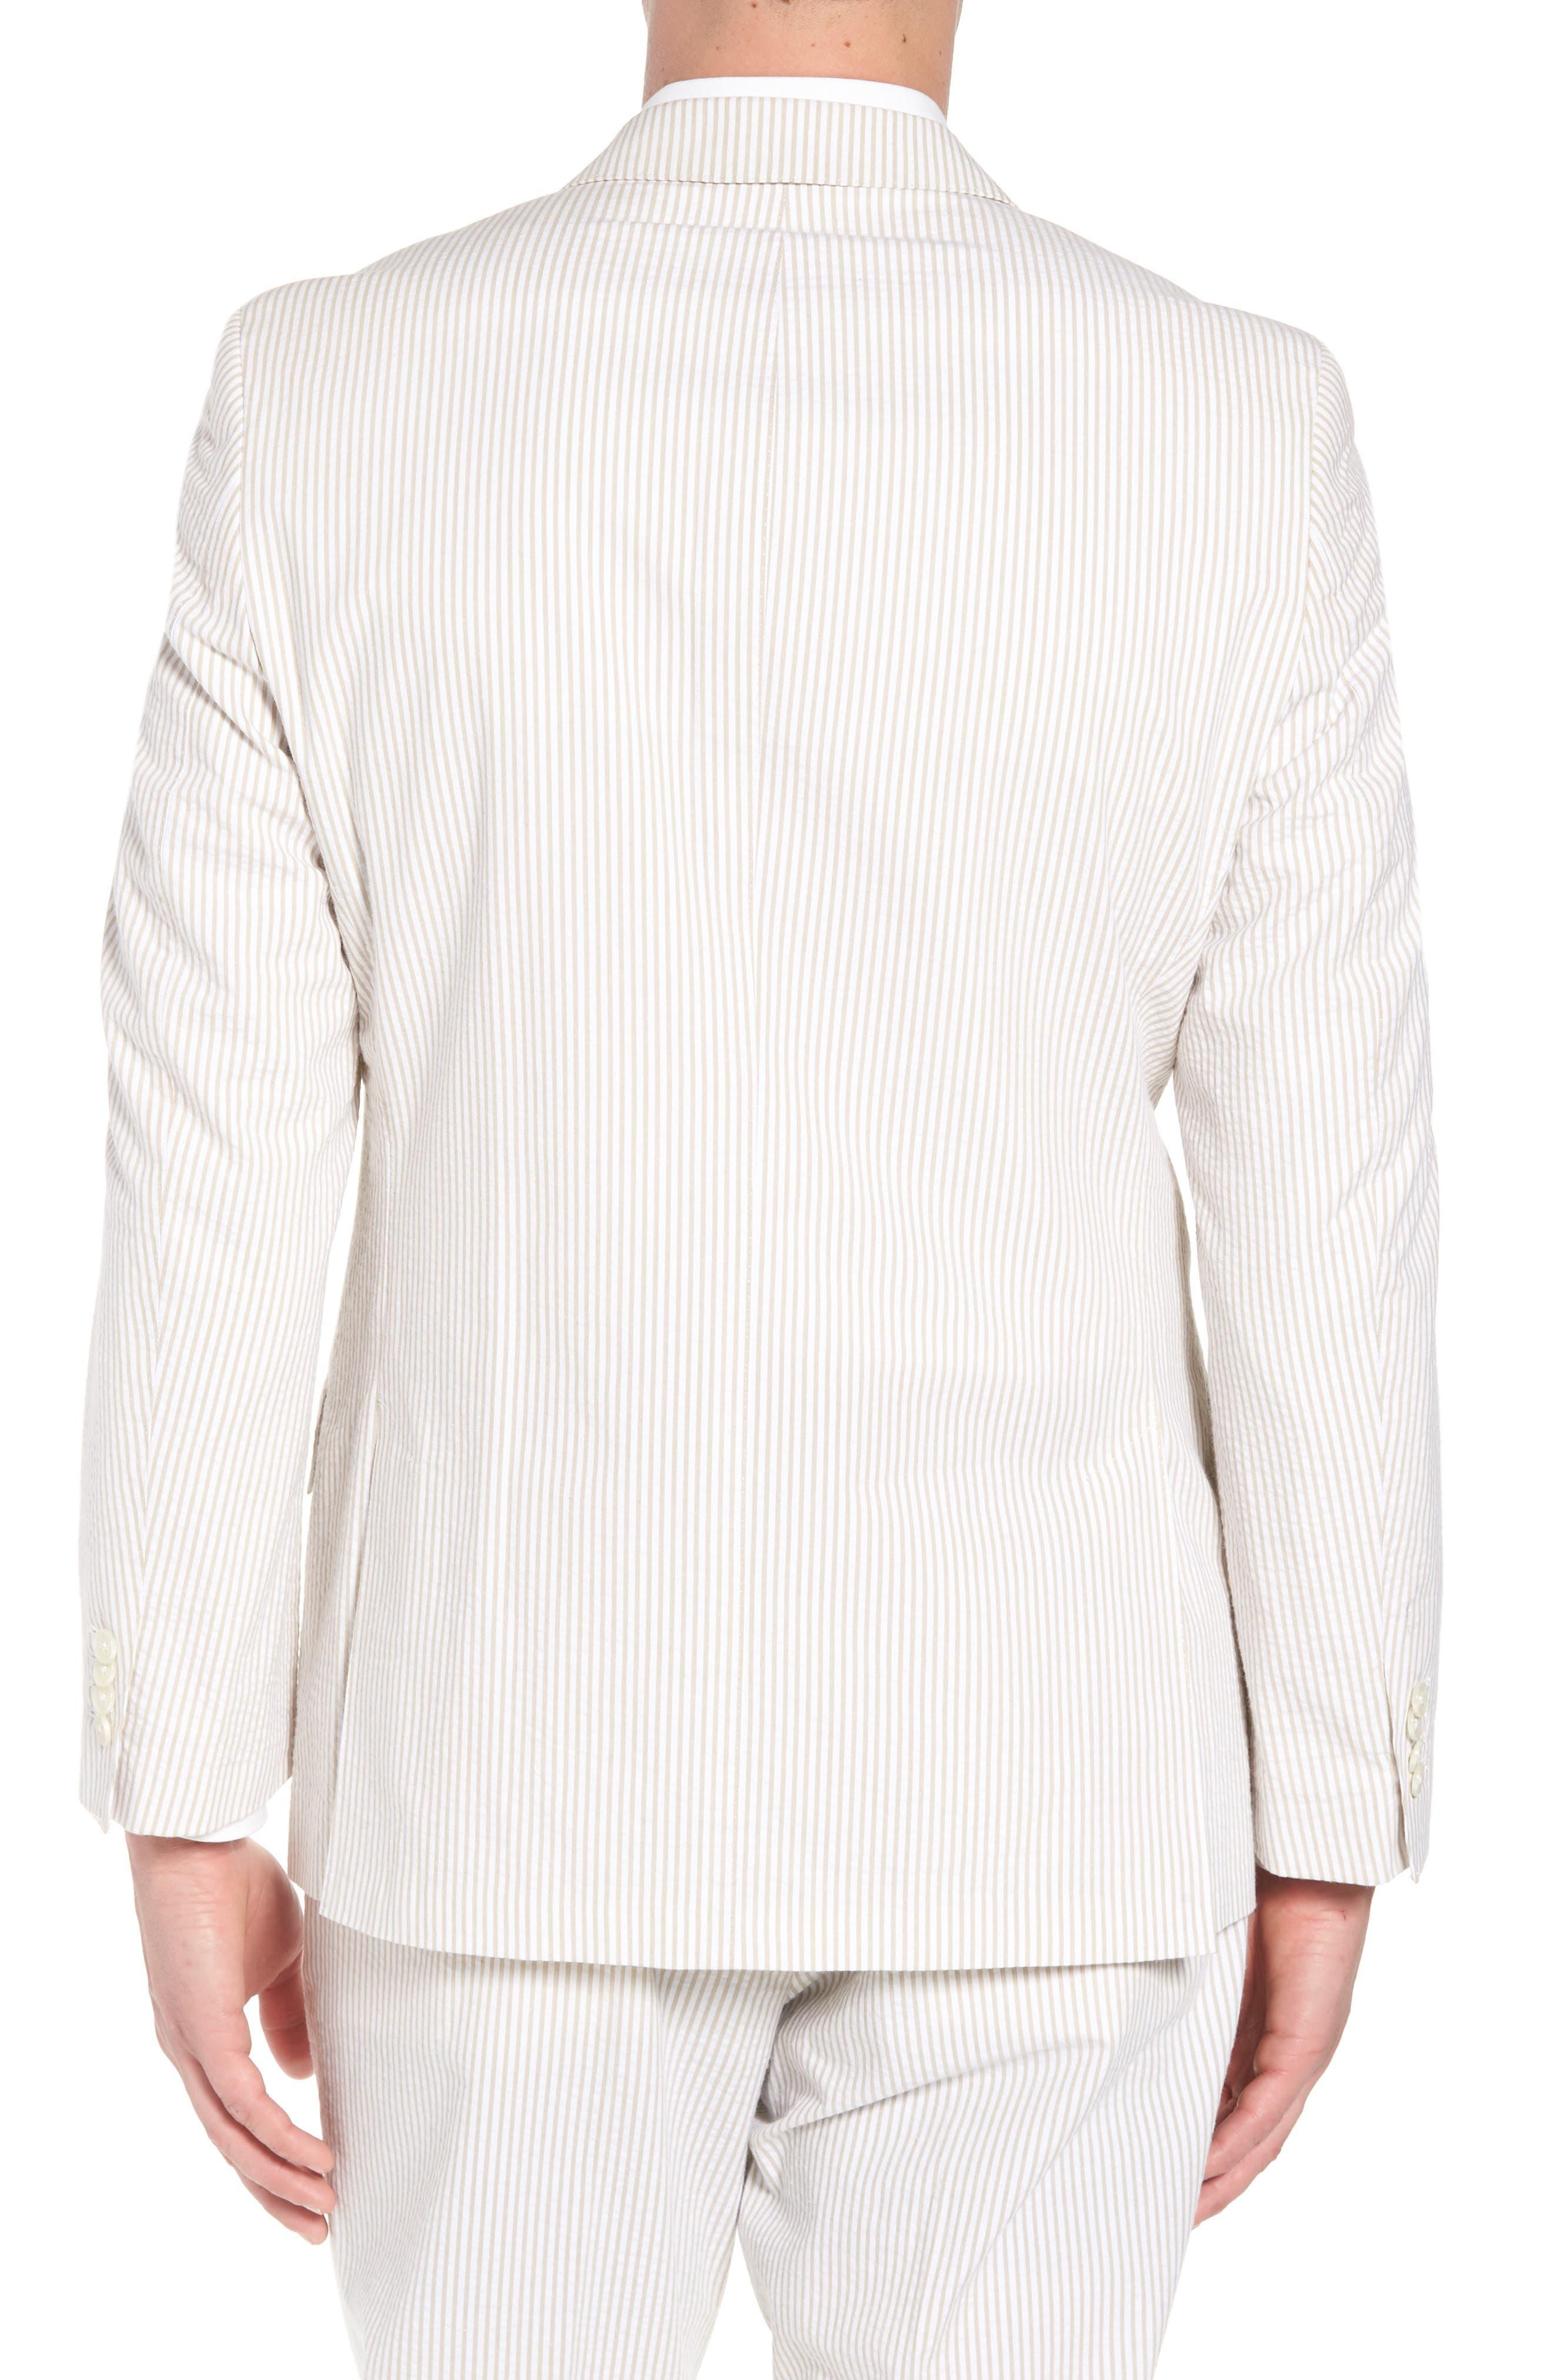 Jack AIM Classic Fit Seersucker Sport Coat,                             Alternate thumbnail 2, color,                             Tan And White